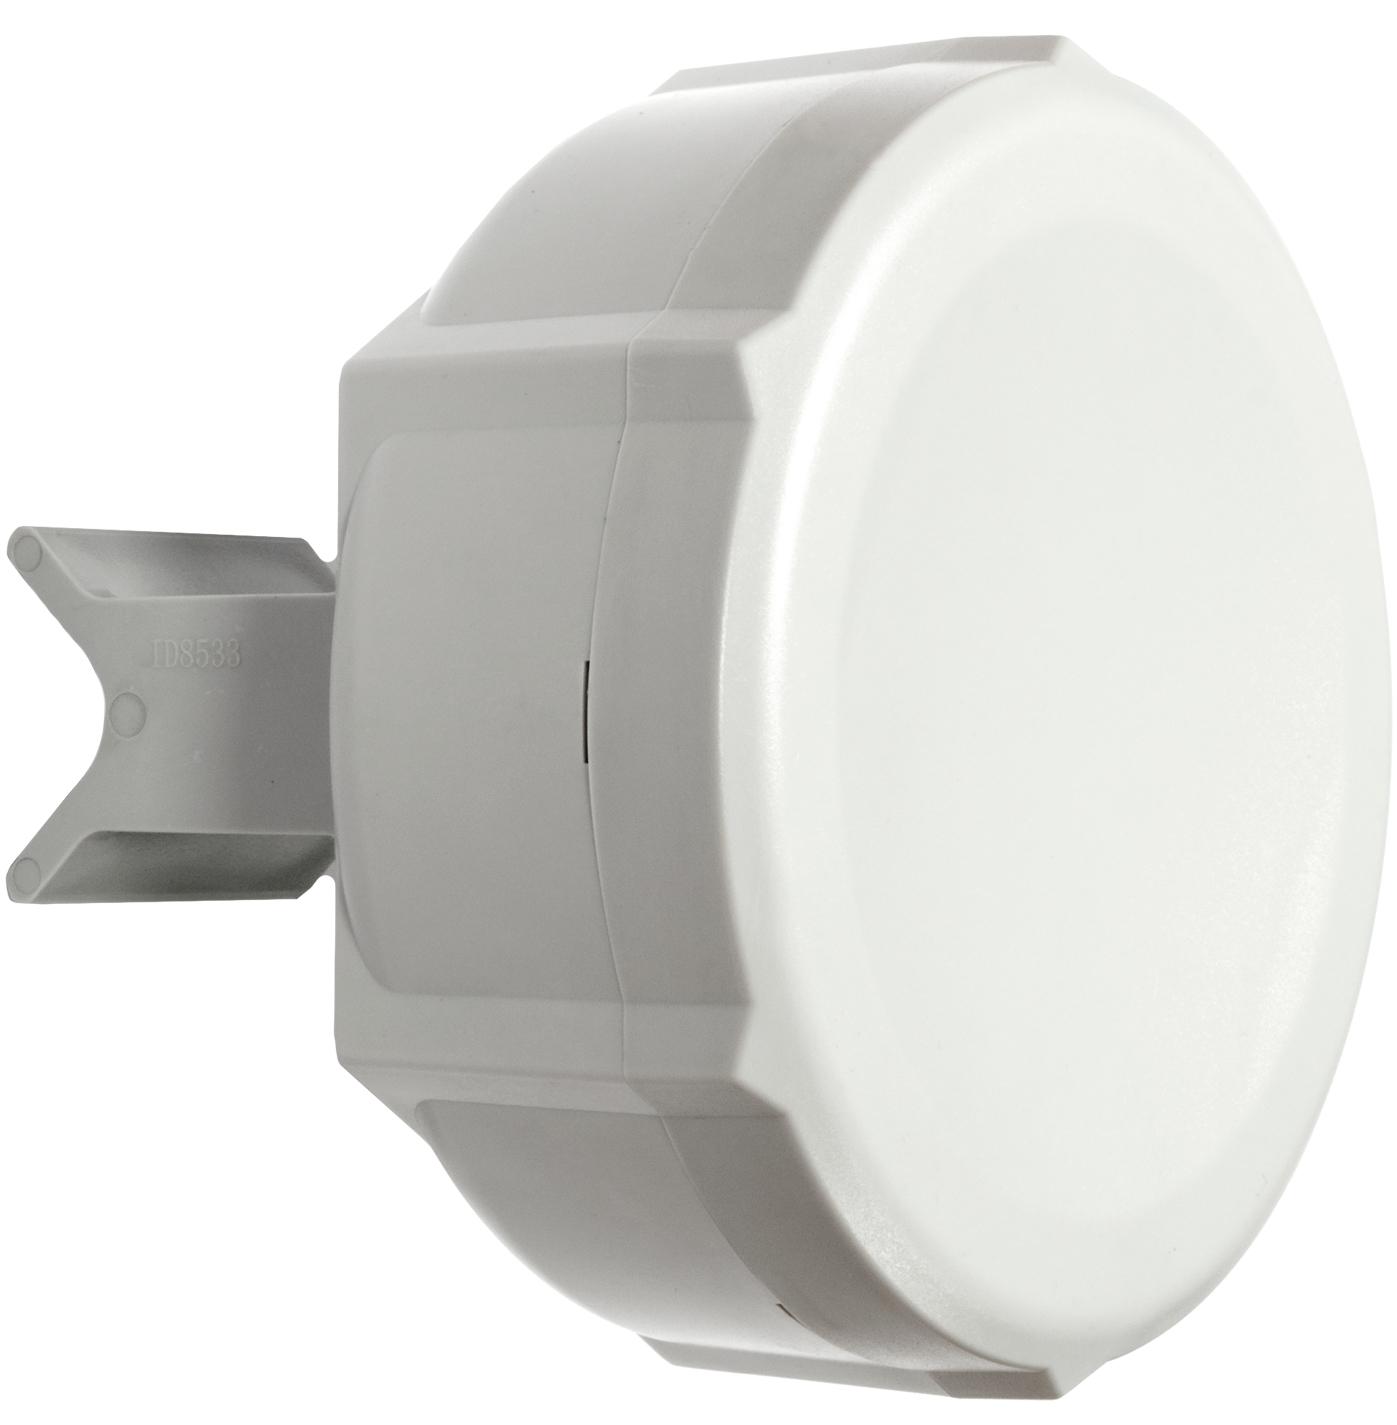 Mikrotik SXT Lite5 Power over Ethernet (PoE) White WLAN access point